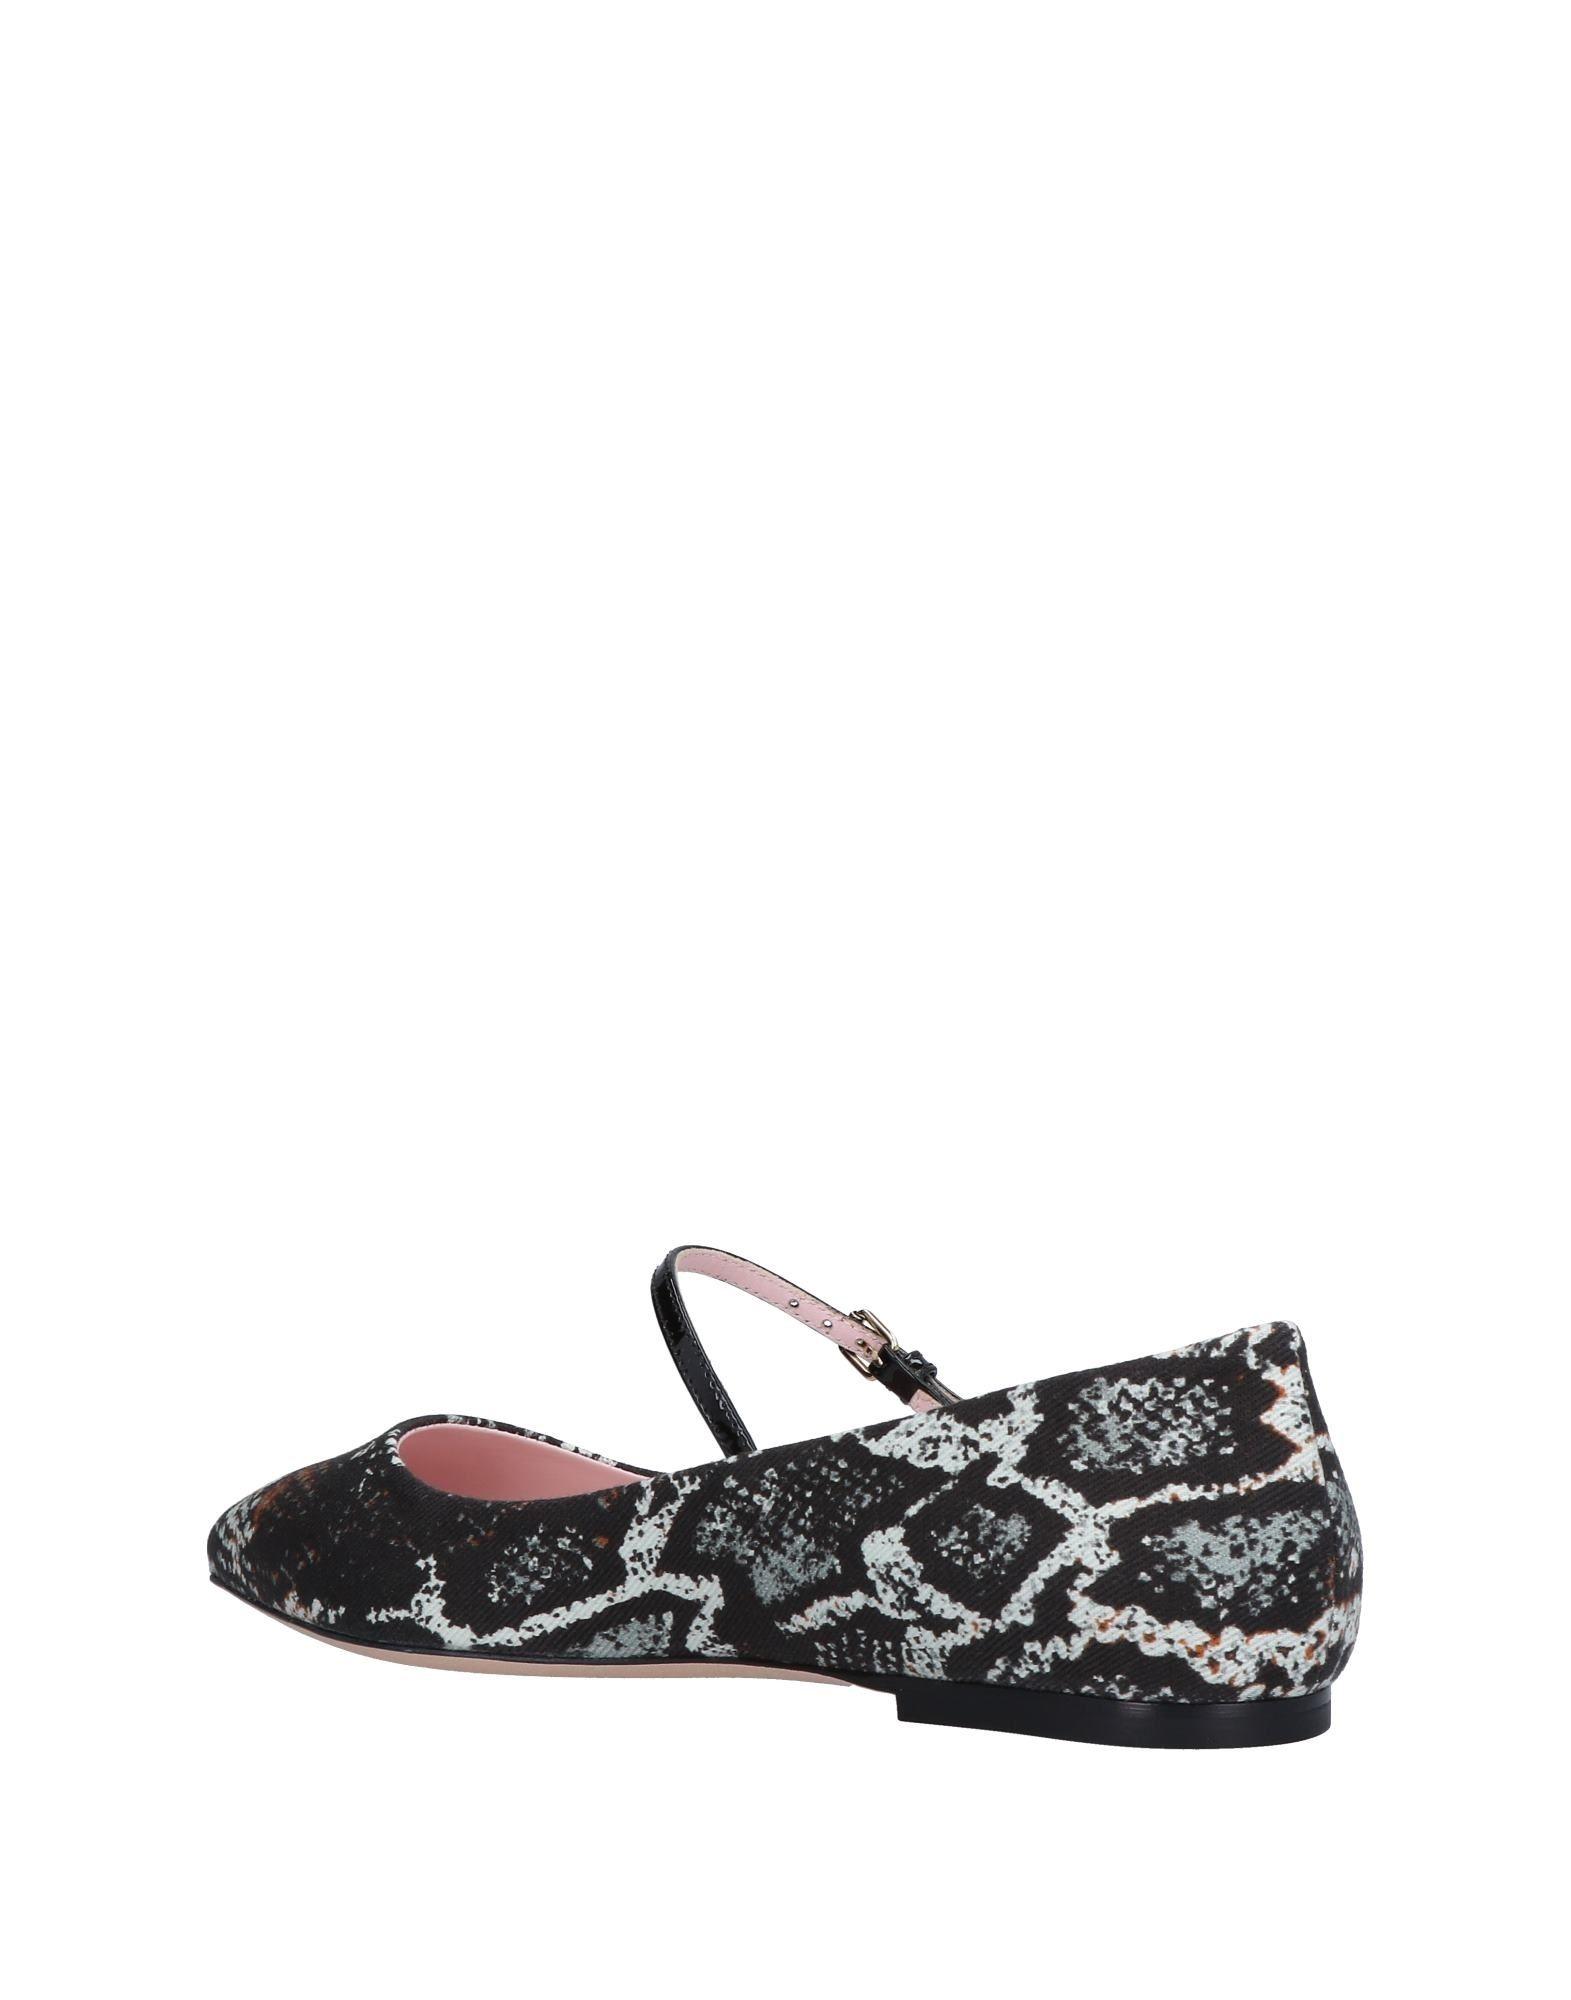 Stilvolle Schuhe billige Schuhe Stilvolle Giamba Ballerinas Damen 11505314LX f13c7e